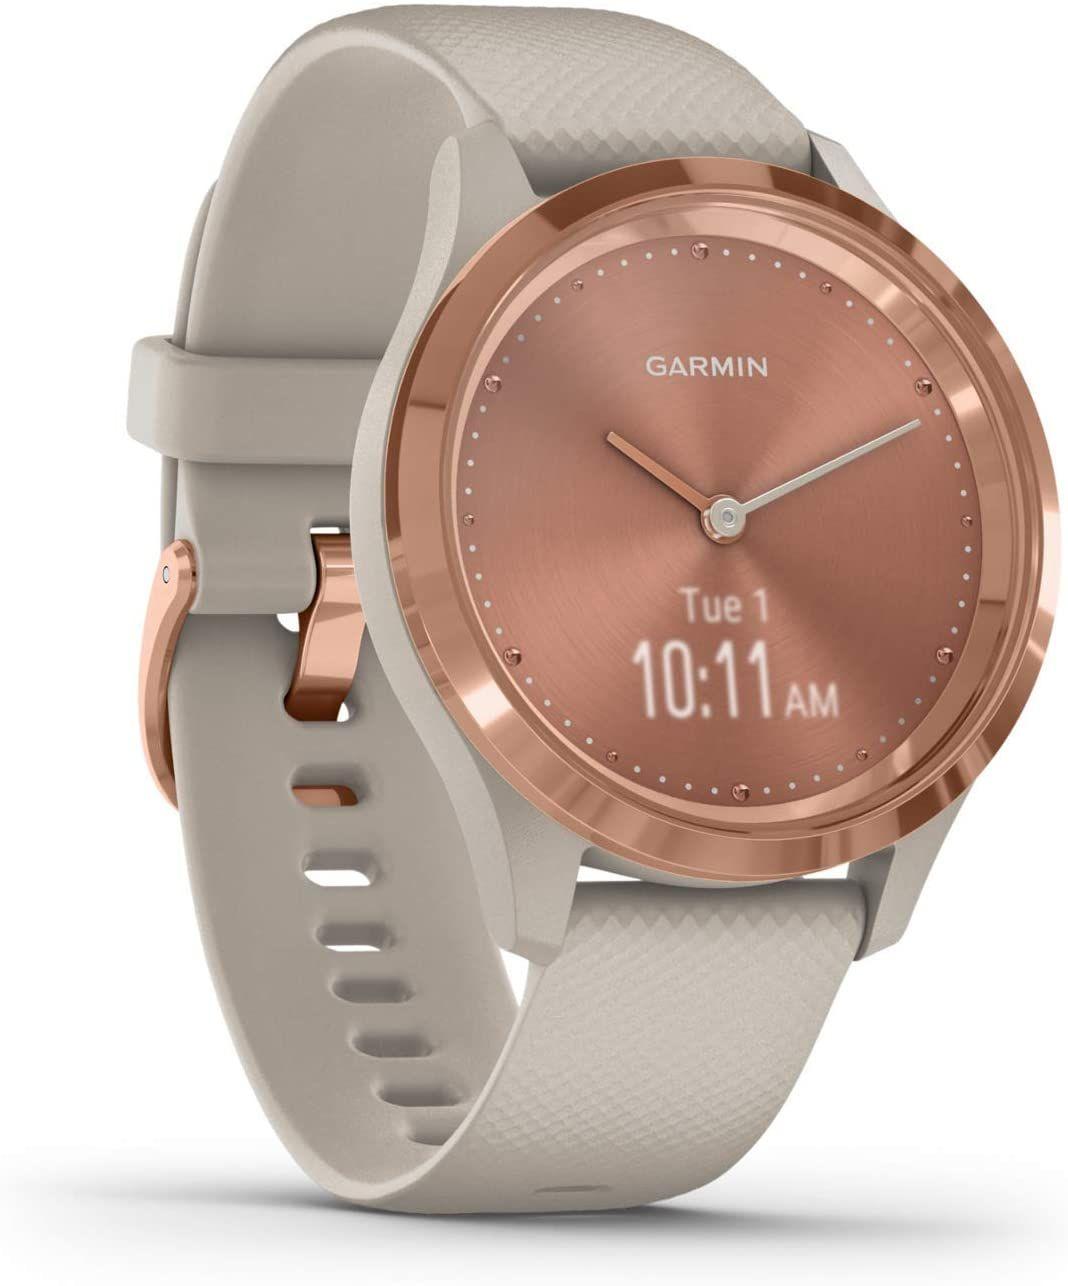 GARMIN Vivomove 3S Sport Smartwatch Polymer Silikon, k.A., Beige/Rosegold [Saturn & Mediamarkt & Amazon]